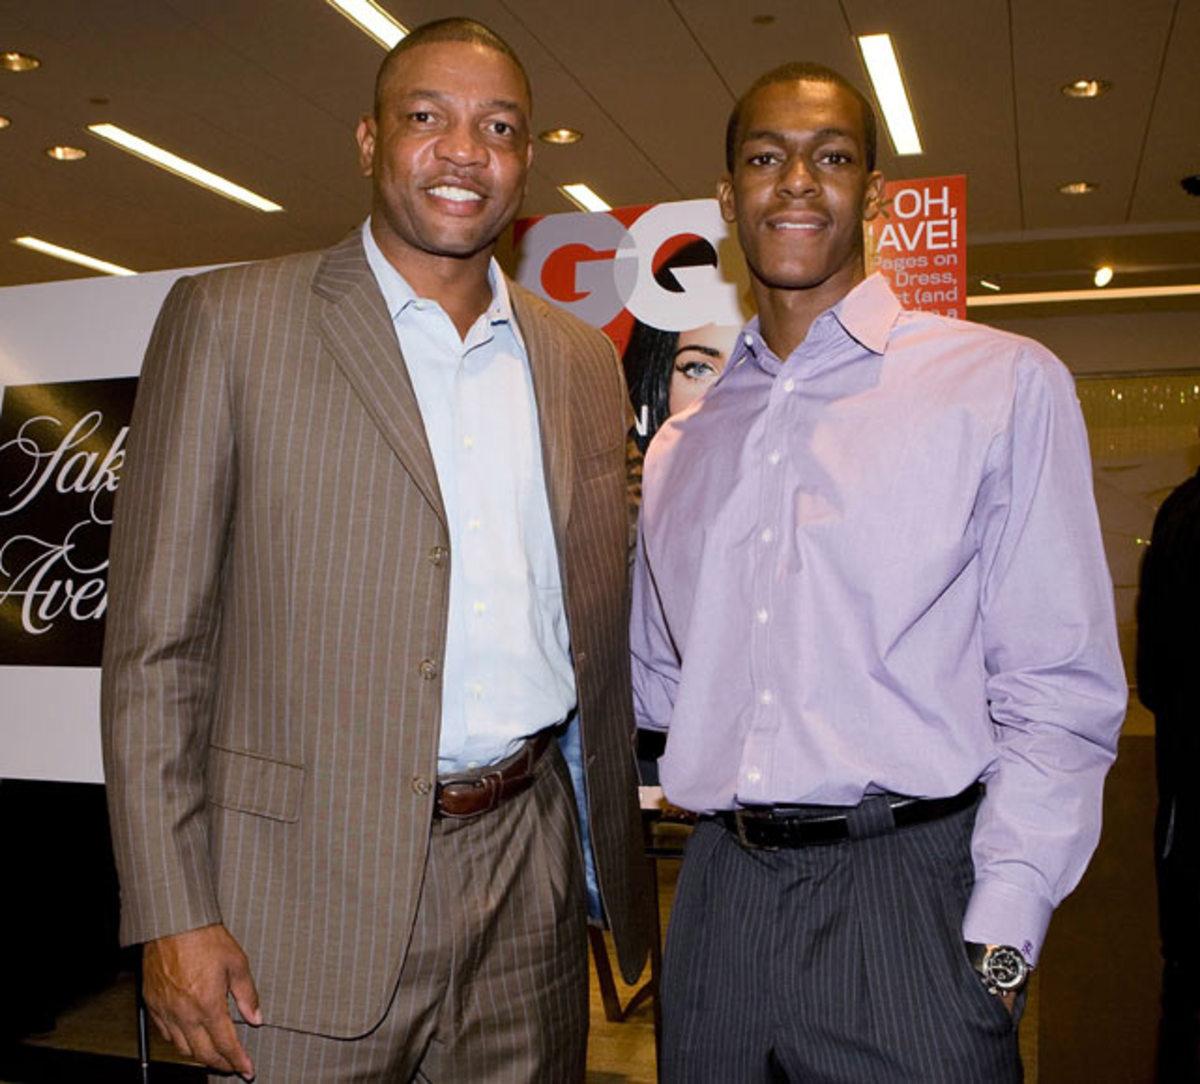 Doc Rivers and Rajon Rondo